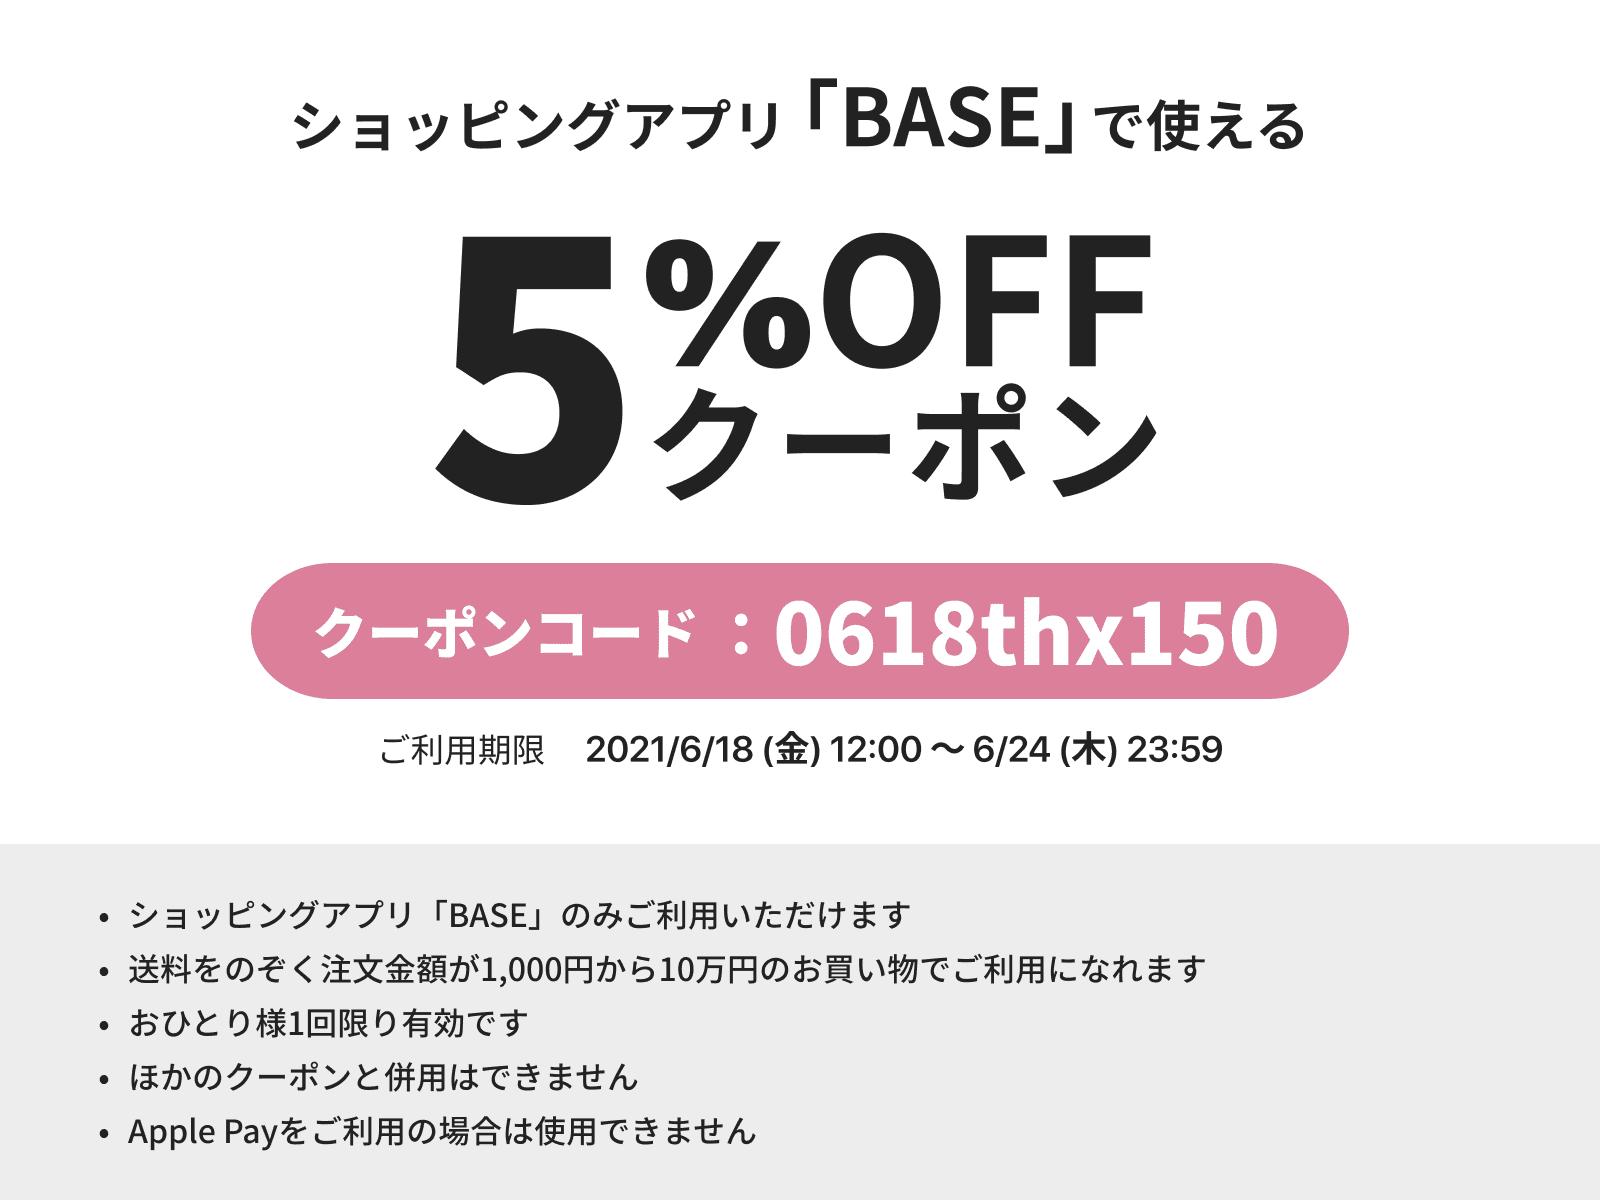 6/18~6/24 期間限定 5%OFF!!